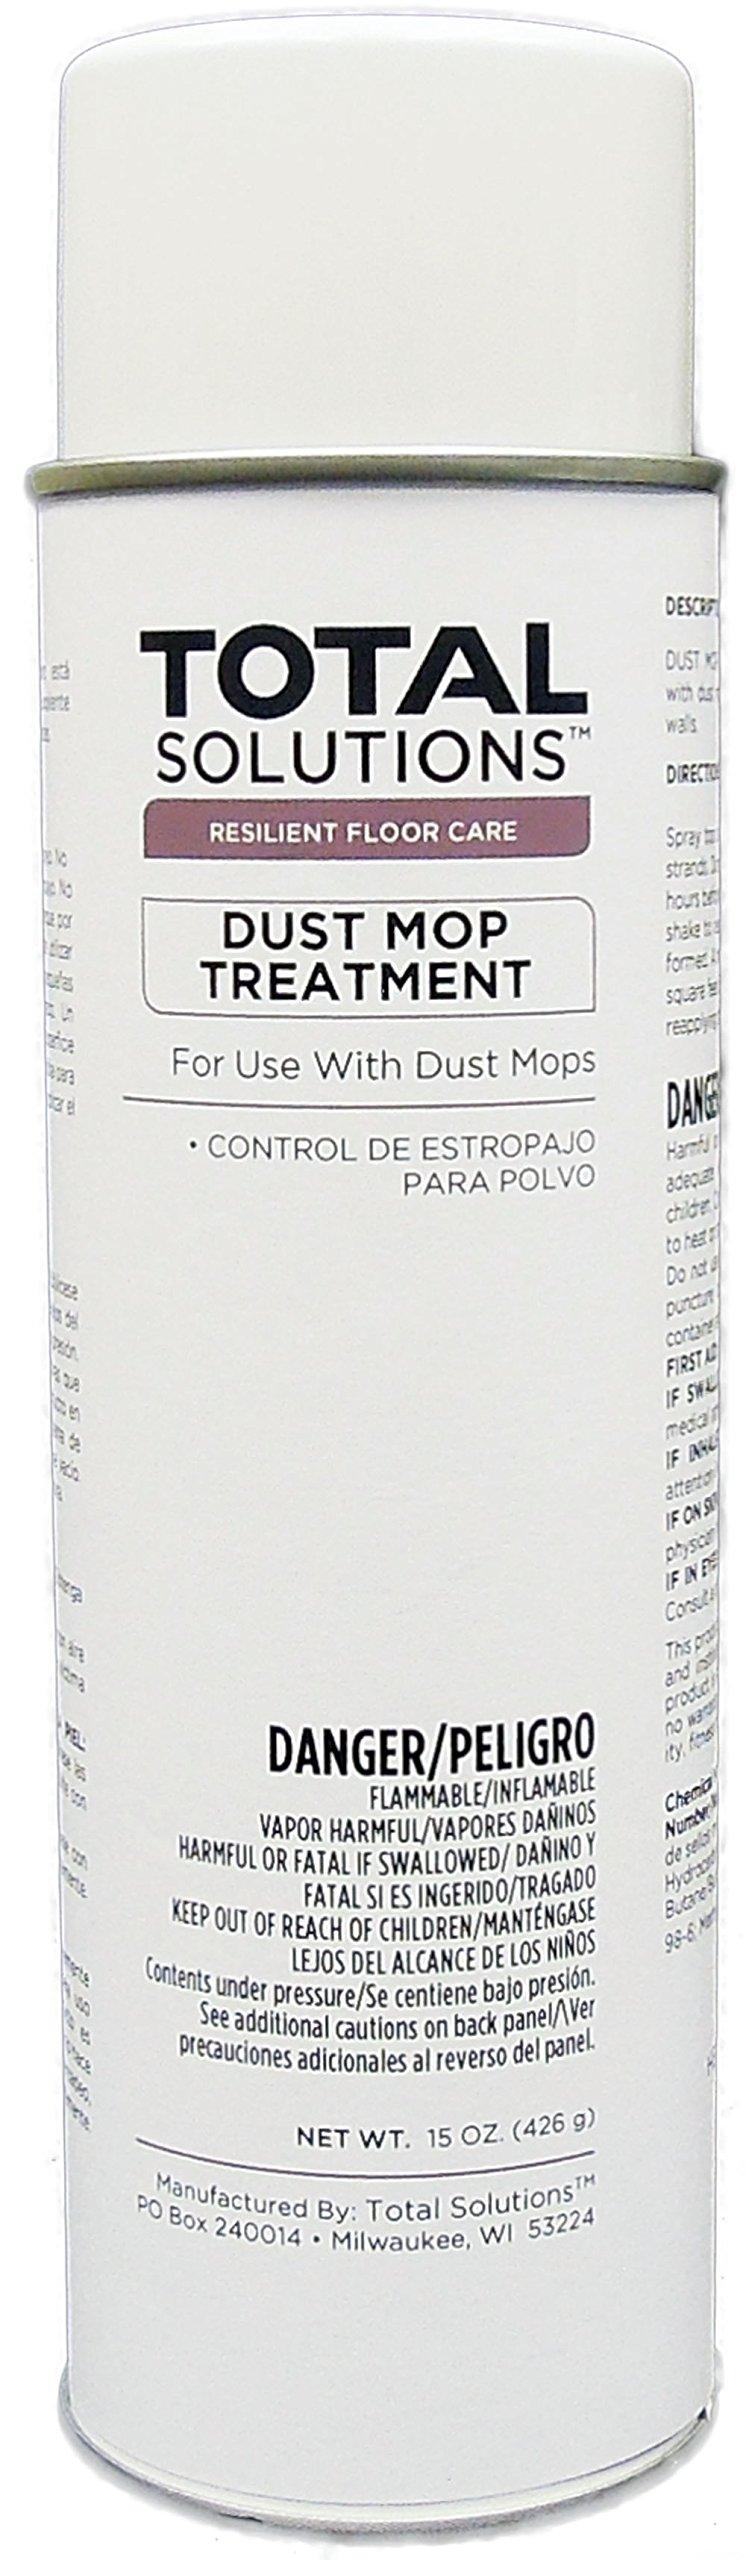 Aerosol Dust Mop Treatment Oil based, Lemon Scented Treatment - 12 Can Case